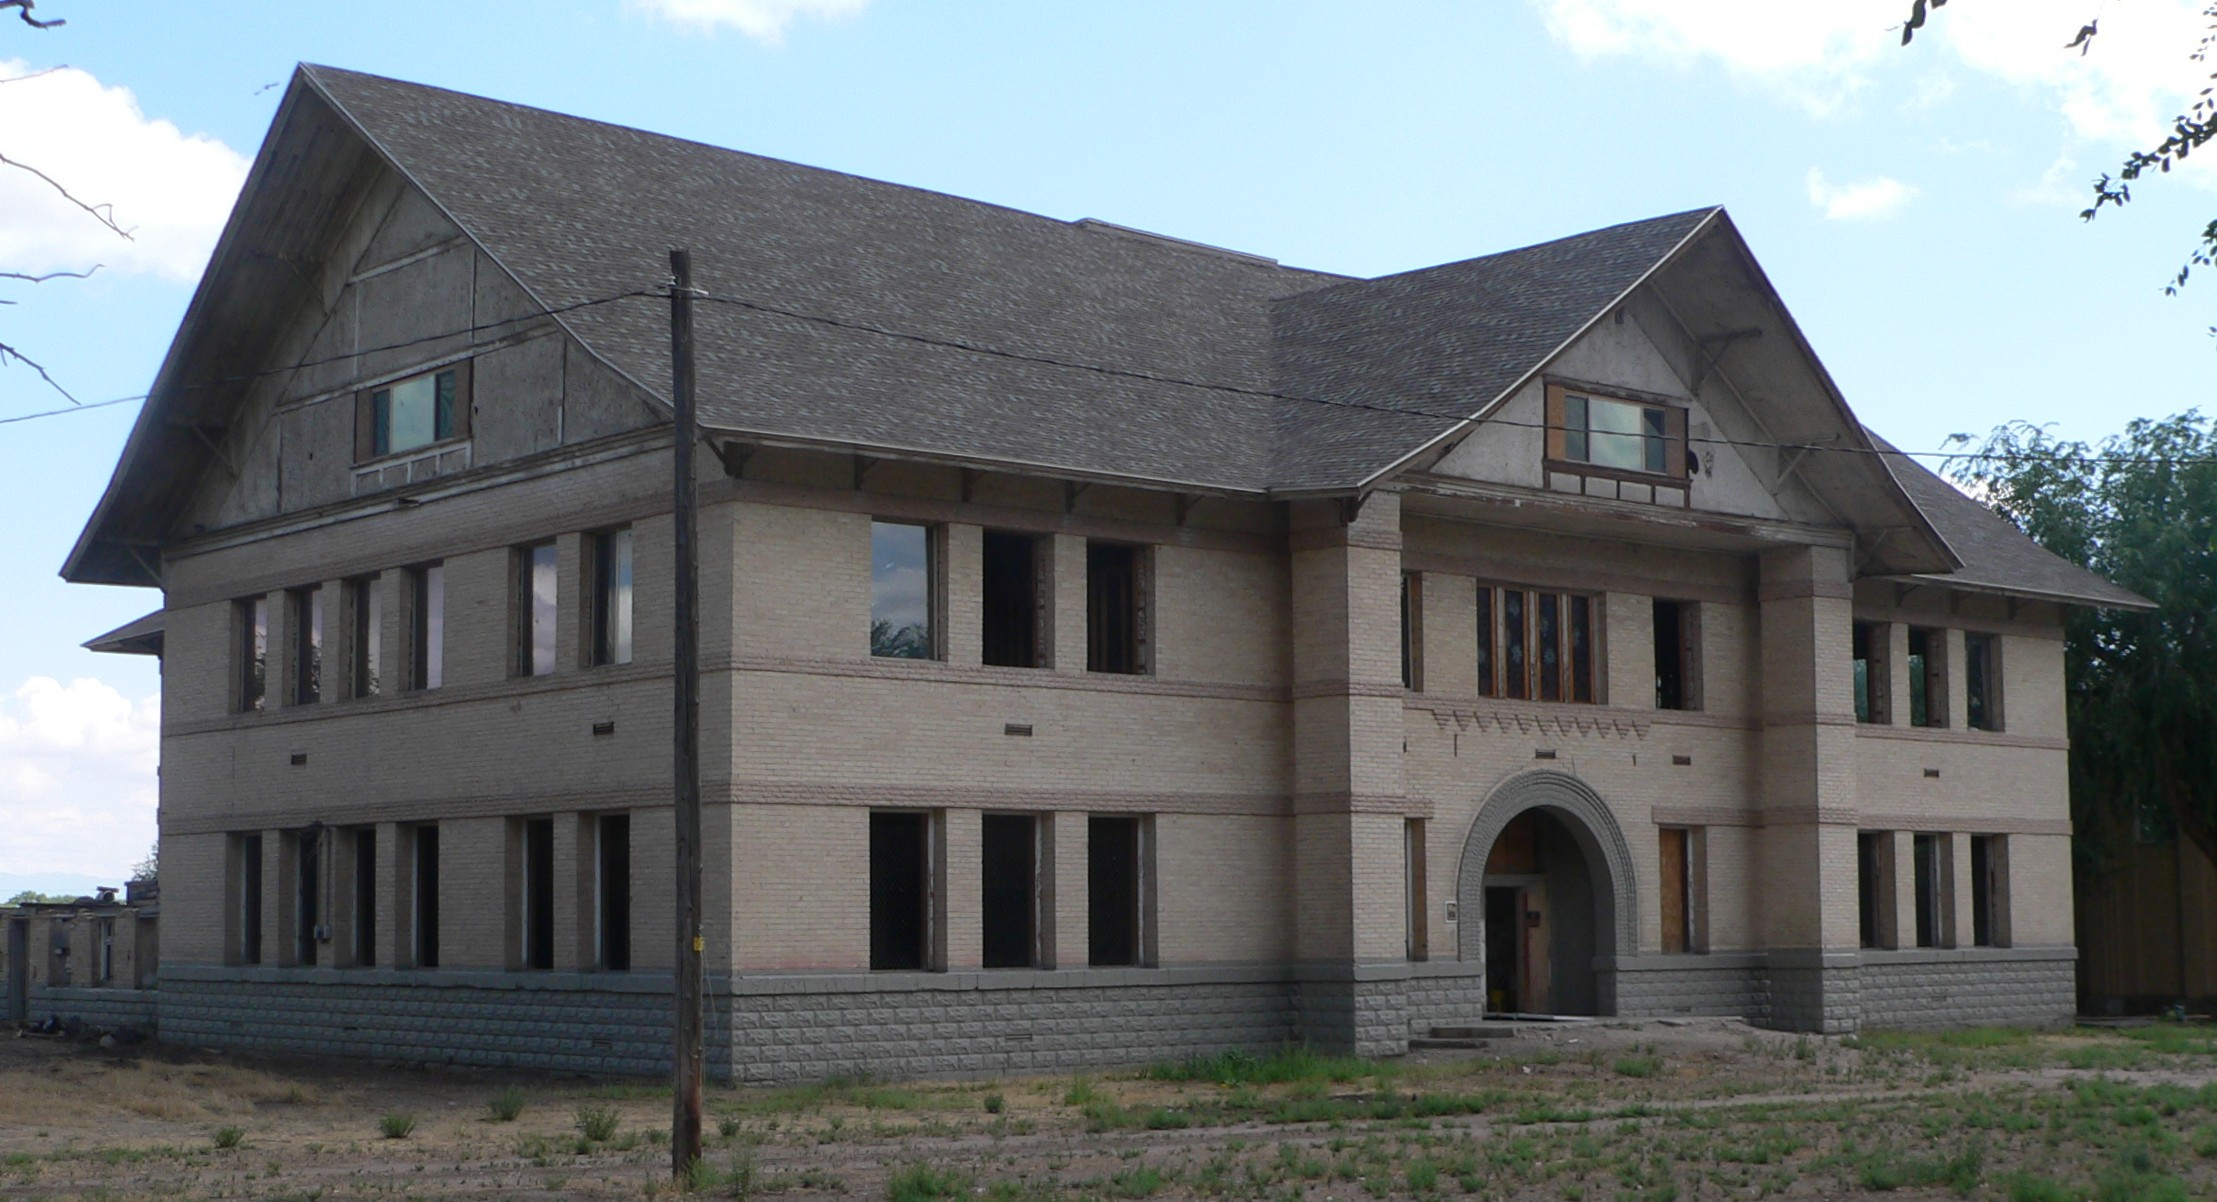 File:Millard Academy (Hinckley, UT) from NW 1.JPG - Wikimedia Commons